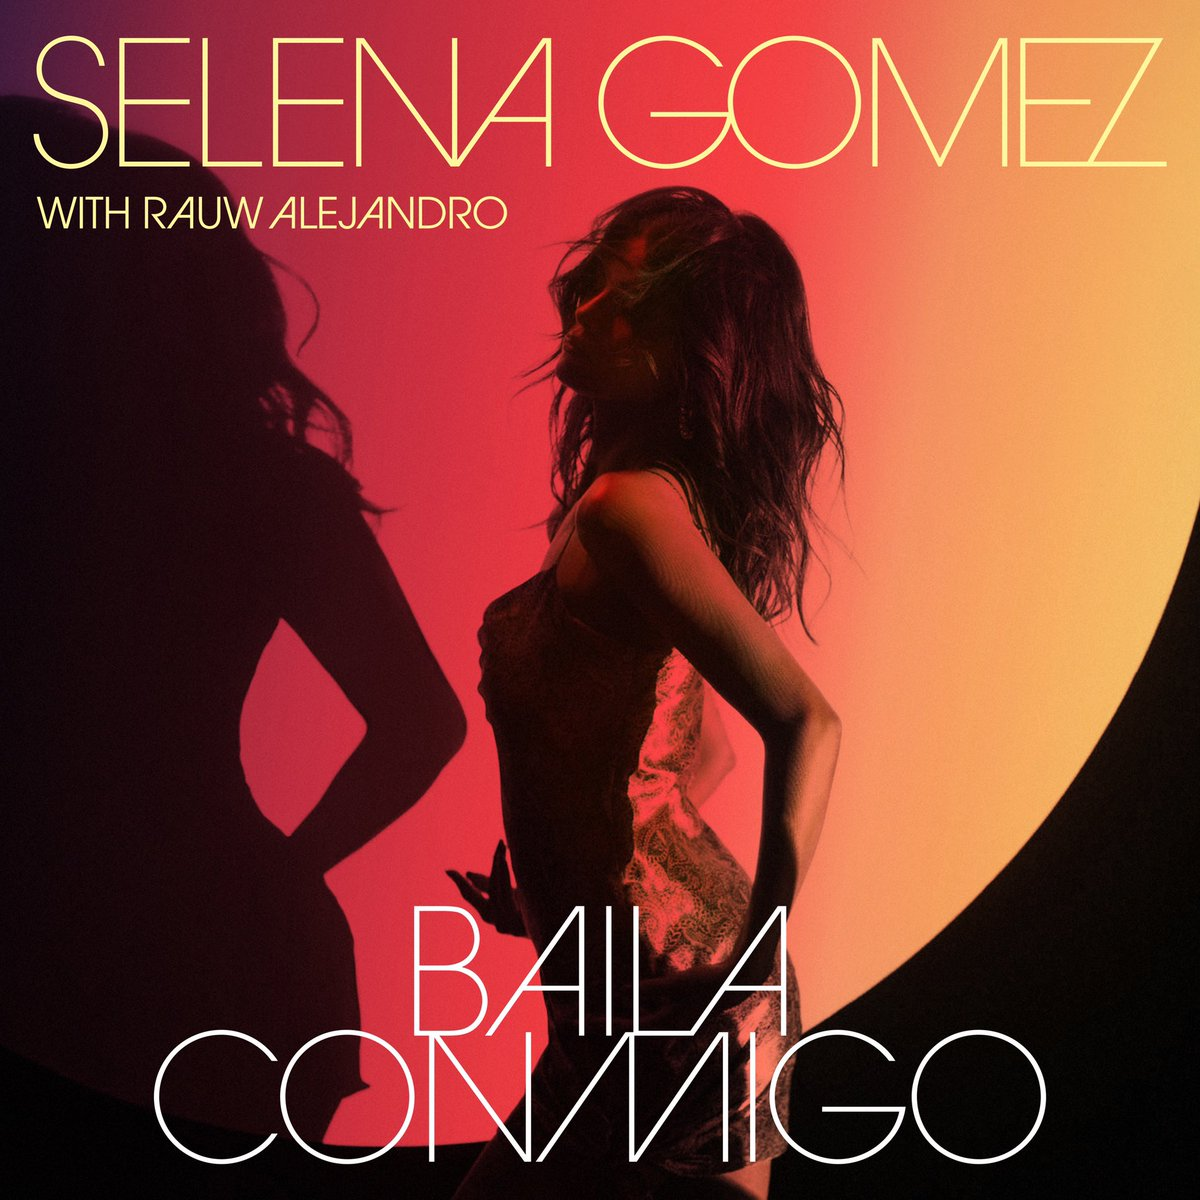 Baila Conmigo💃🏻con @RauwAlejandro y @tainy disponibleel29 deenero. Presave ahora. // Baila Conmigo with Rauw Alejandro and Tainy is out January 29th. Presave Now.